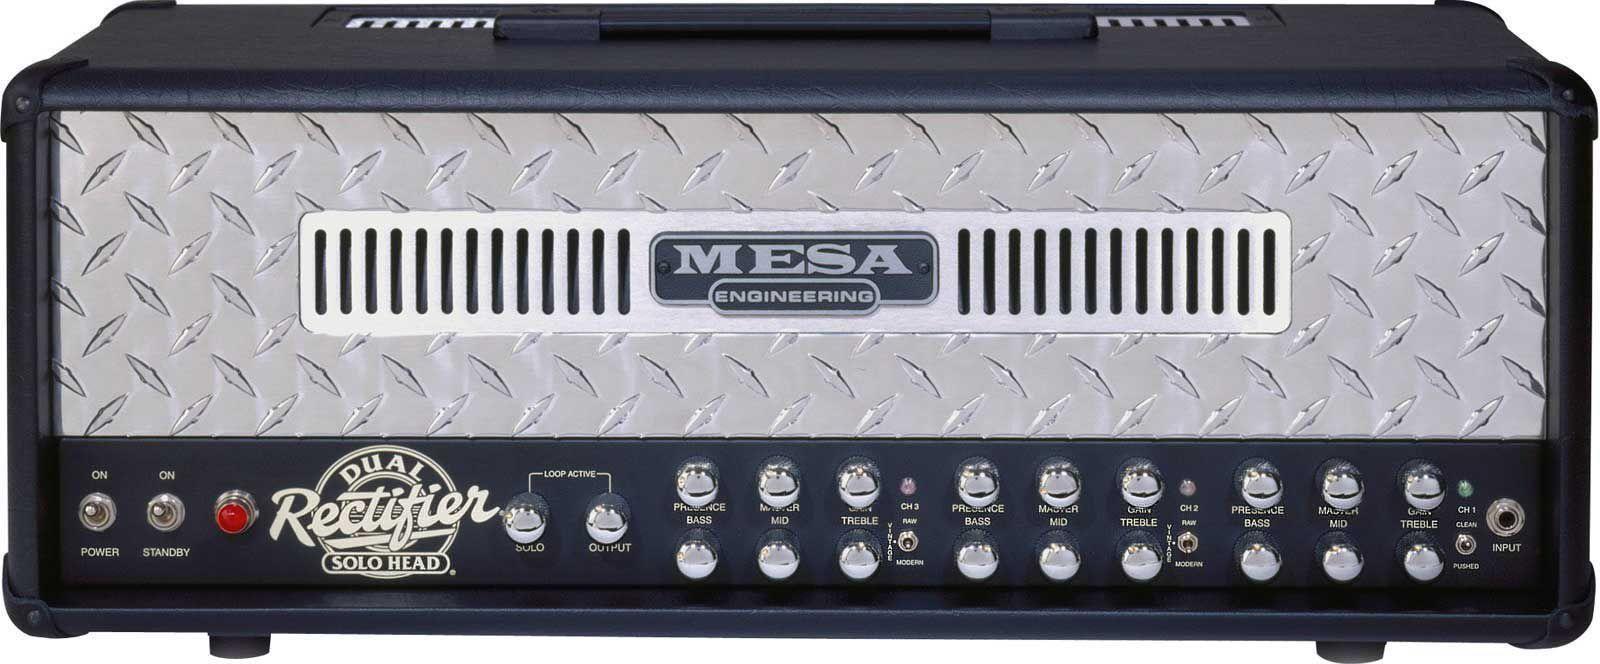 dual rectifier solo head 100w mesa boogie audiofanzine. Black Bedroom Furniture Sets. Home Design Ideas